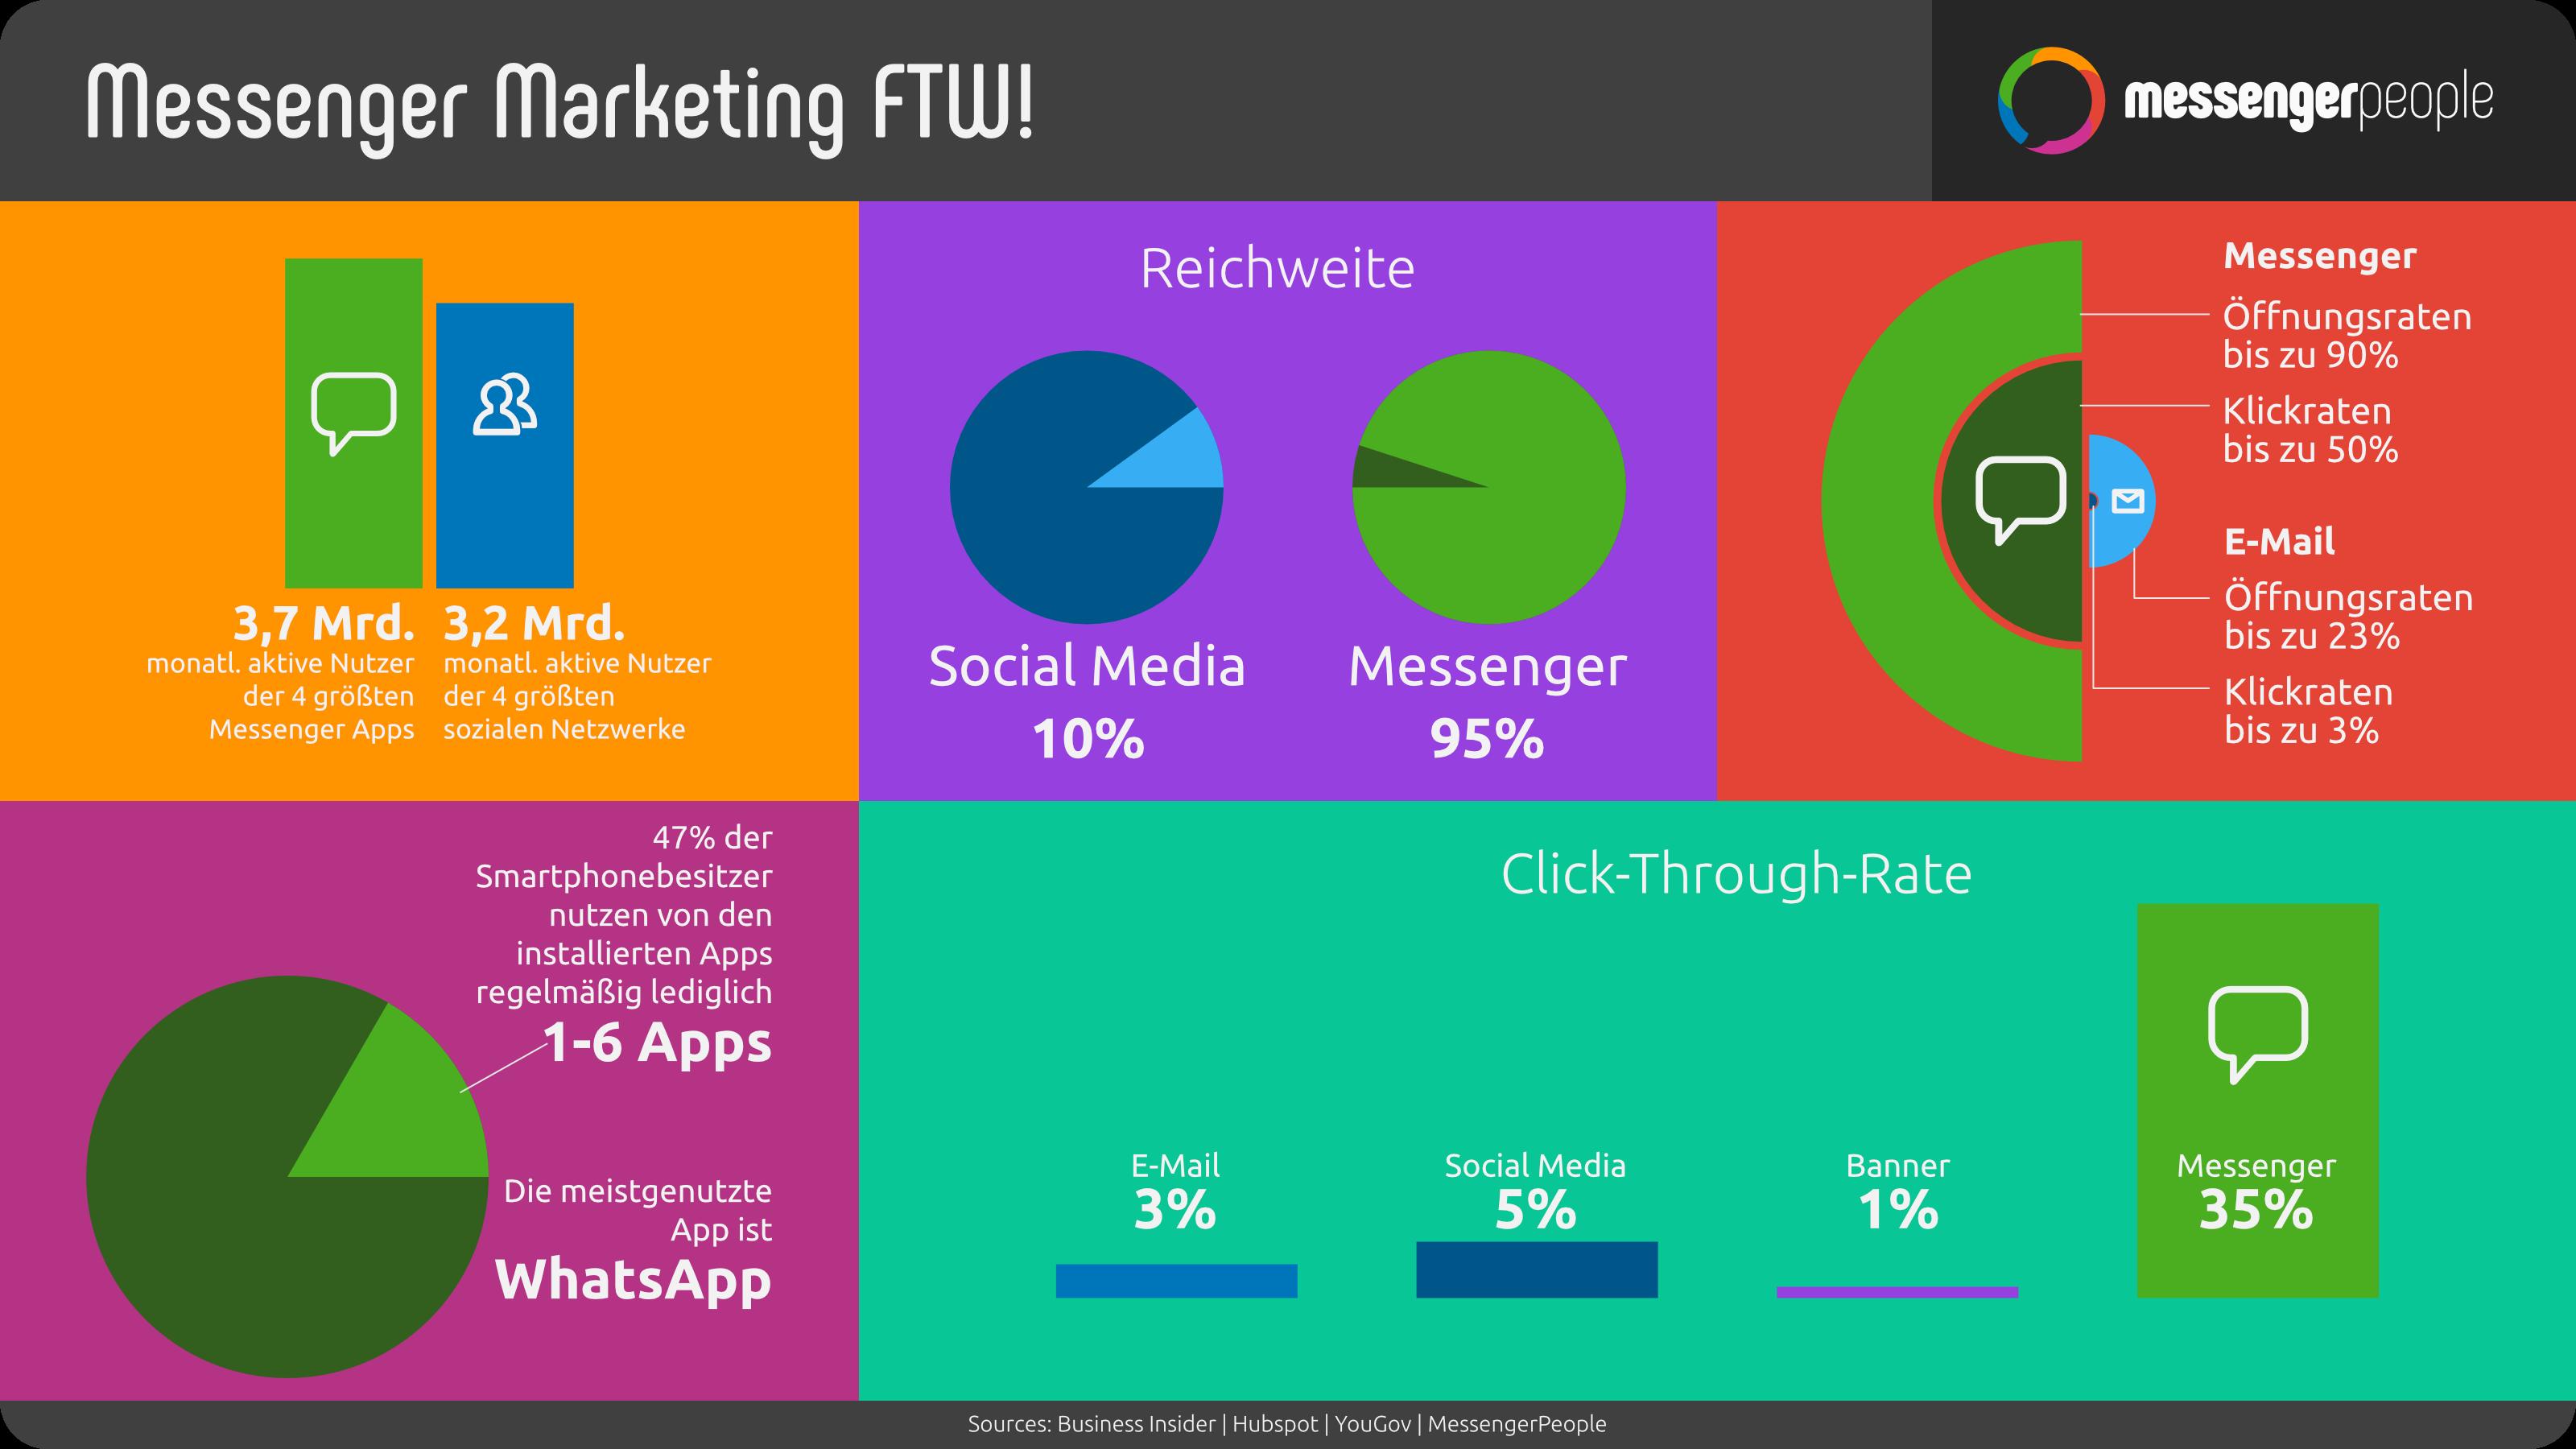 Messenger Marketing for the win: Messenger Marketing Nutzer sind hoch